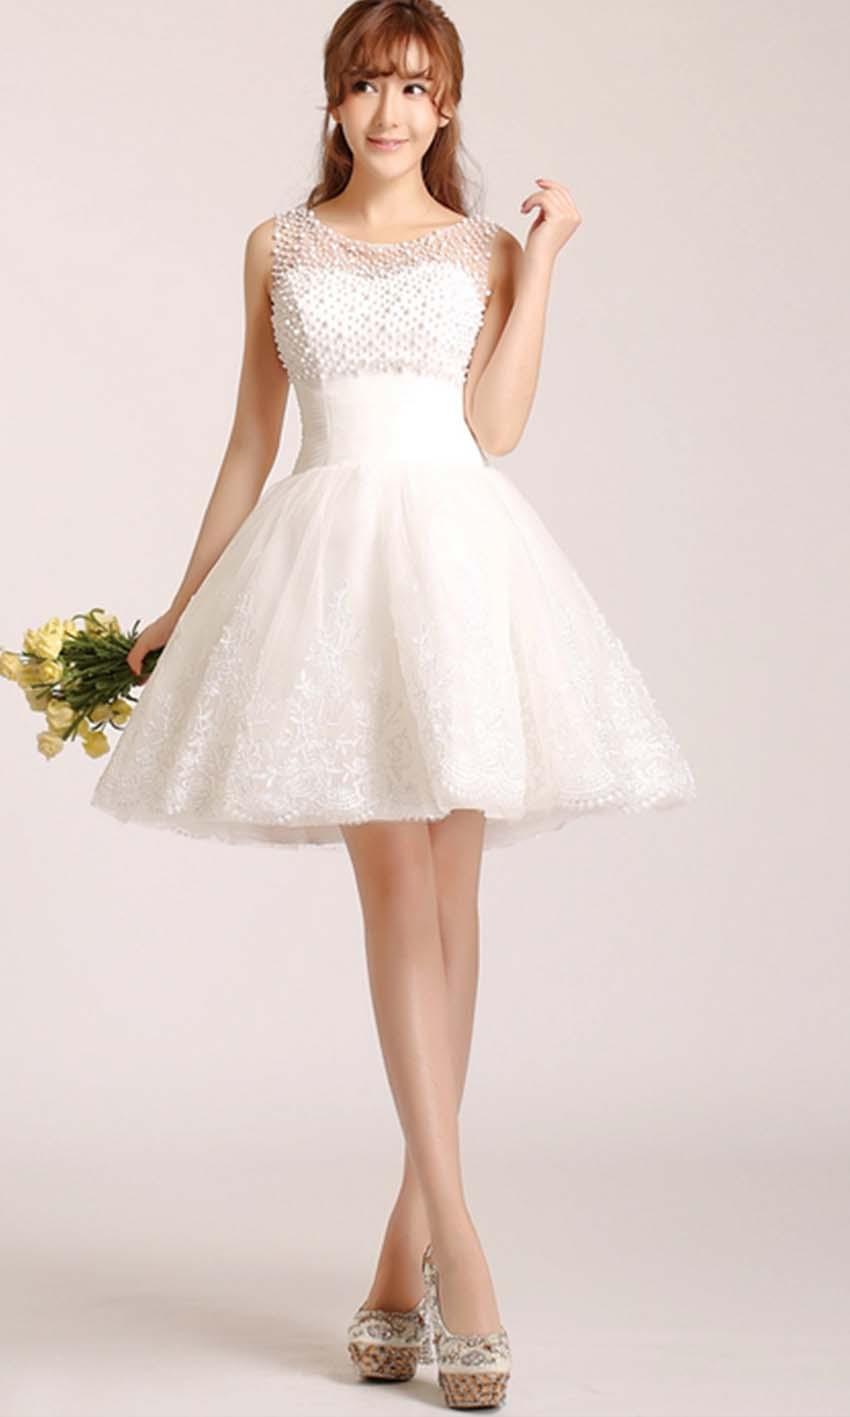 white short wedding dresses cheap photo - 1